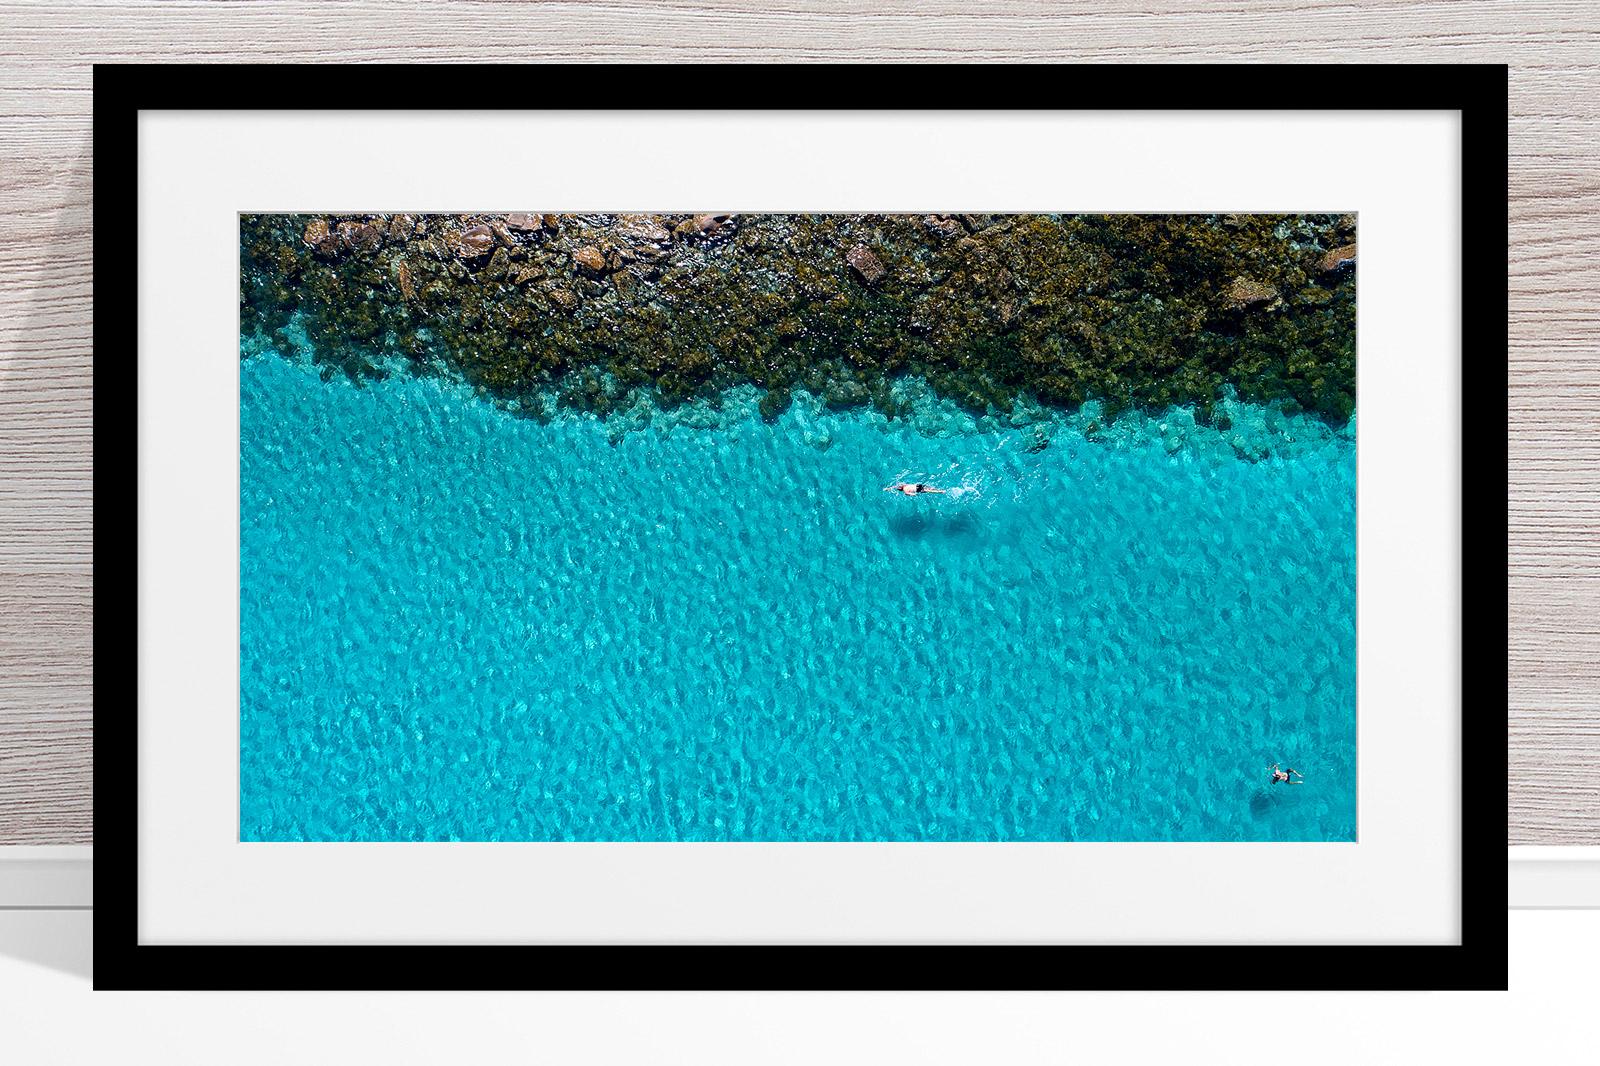 026 - Jason Mazur - 'Swimmers, Geographe Bay, Dunsborough' Black Frame